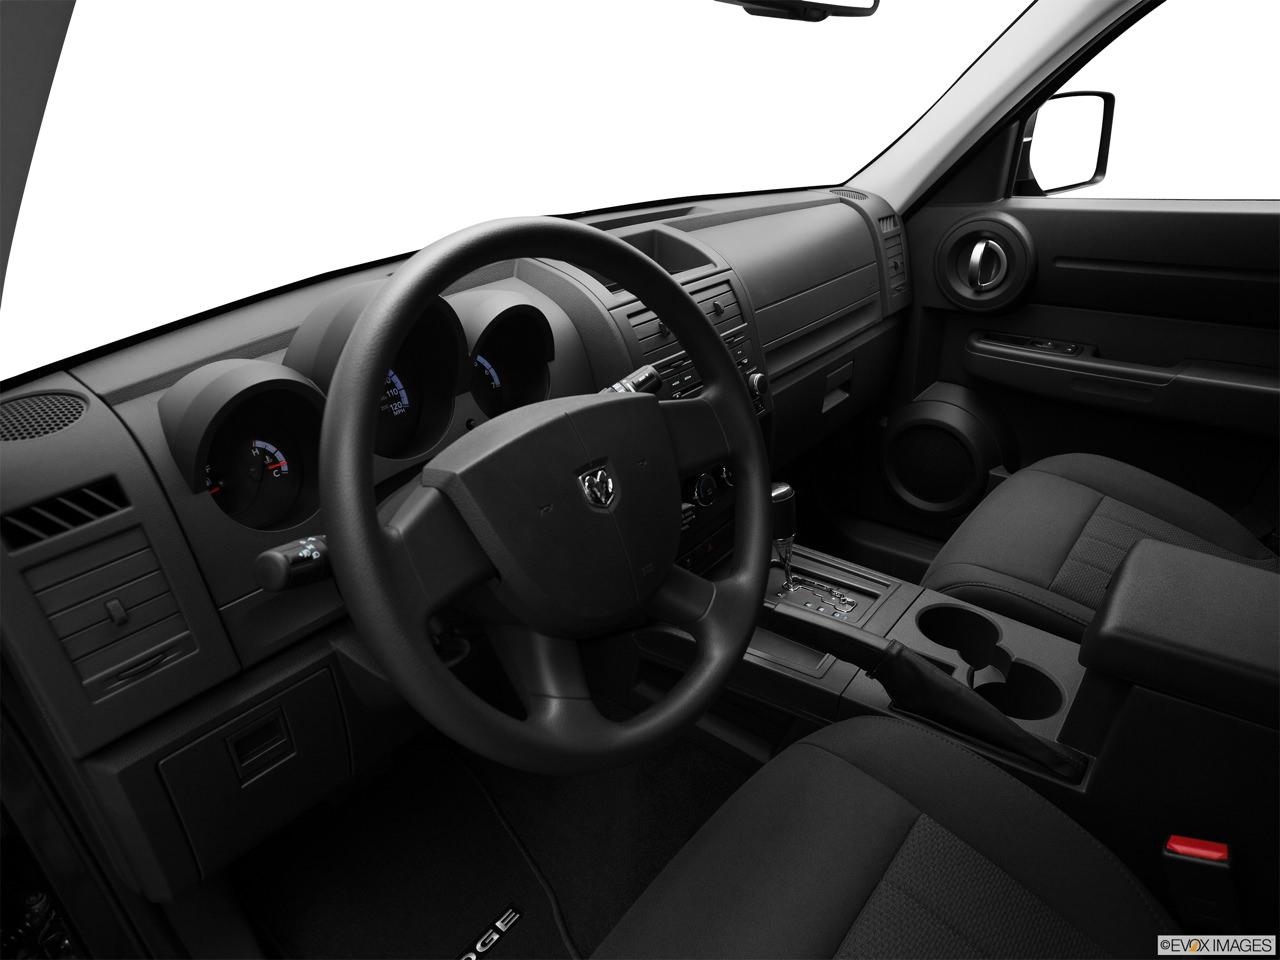 Dodge Nitro 2011 Interior